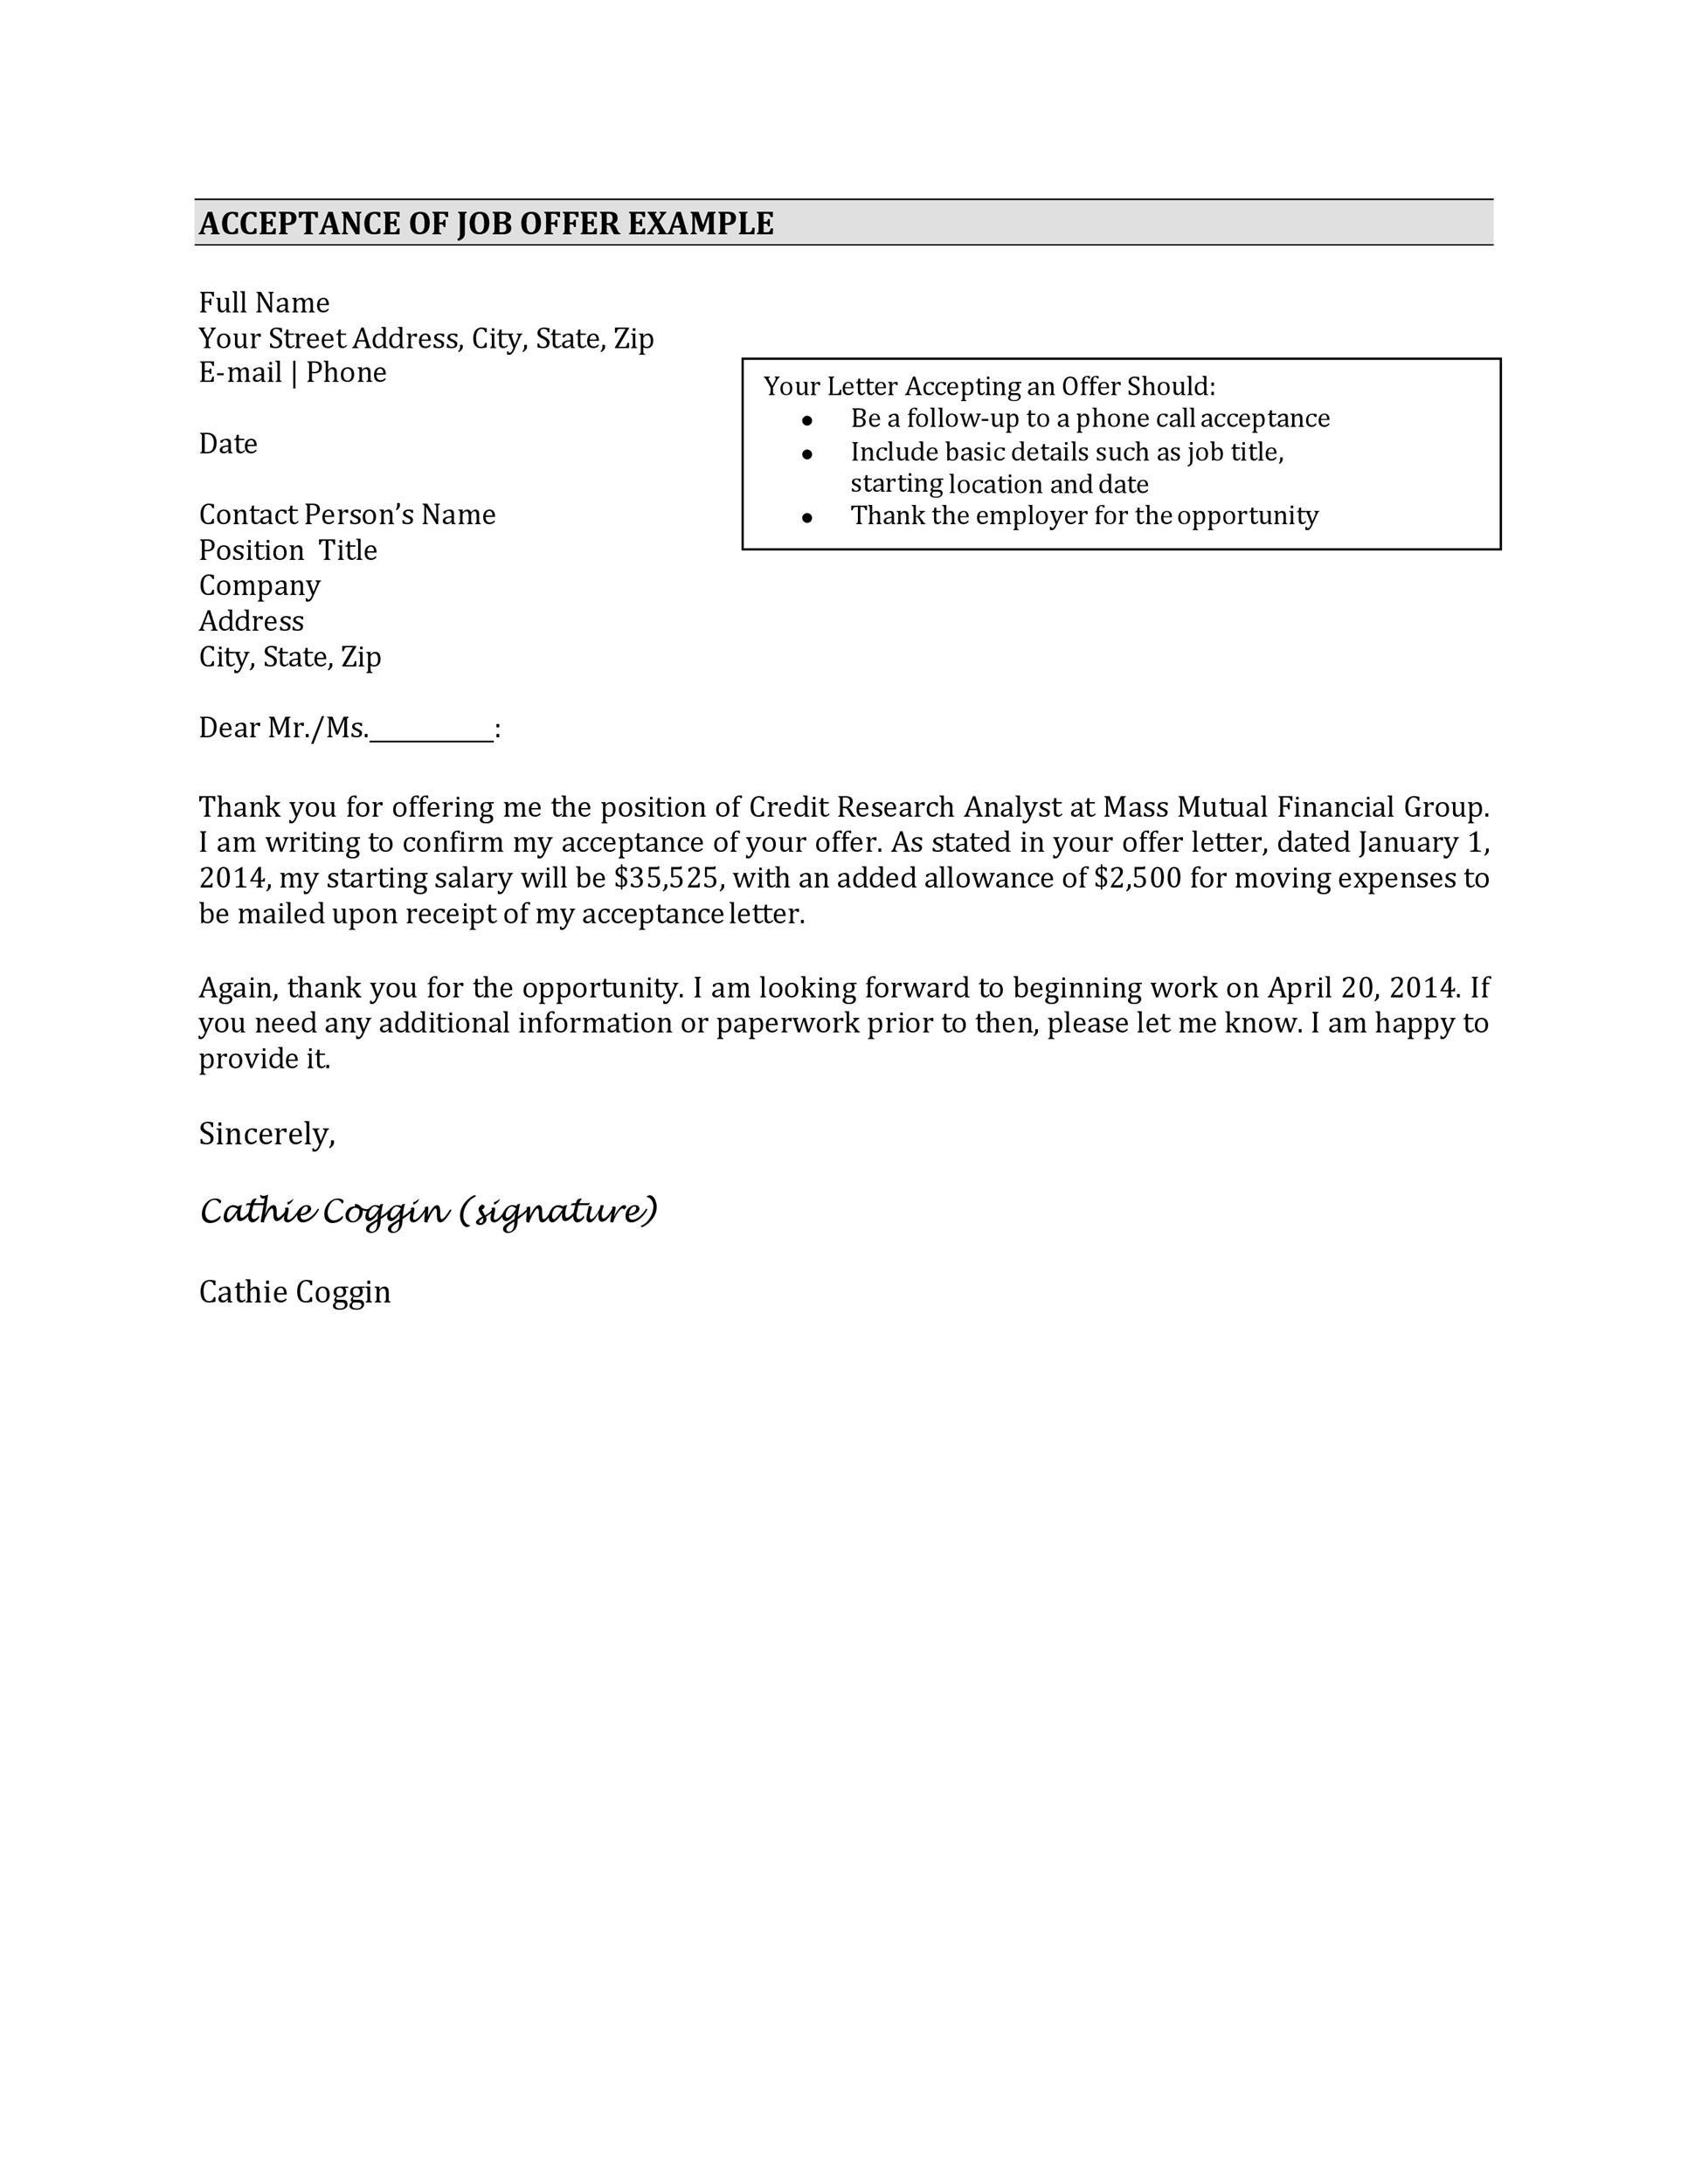 How To Write A Job Offer Acceptance Letter lvcrelegantcom